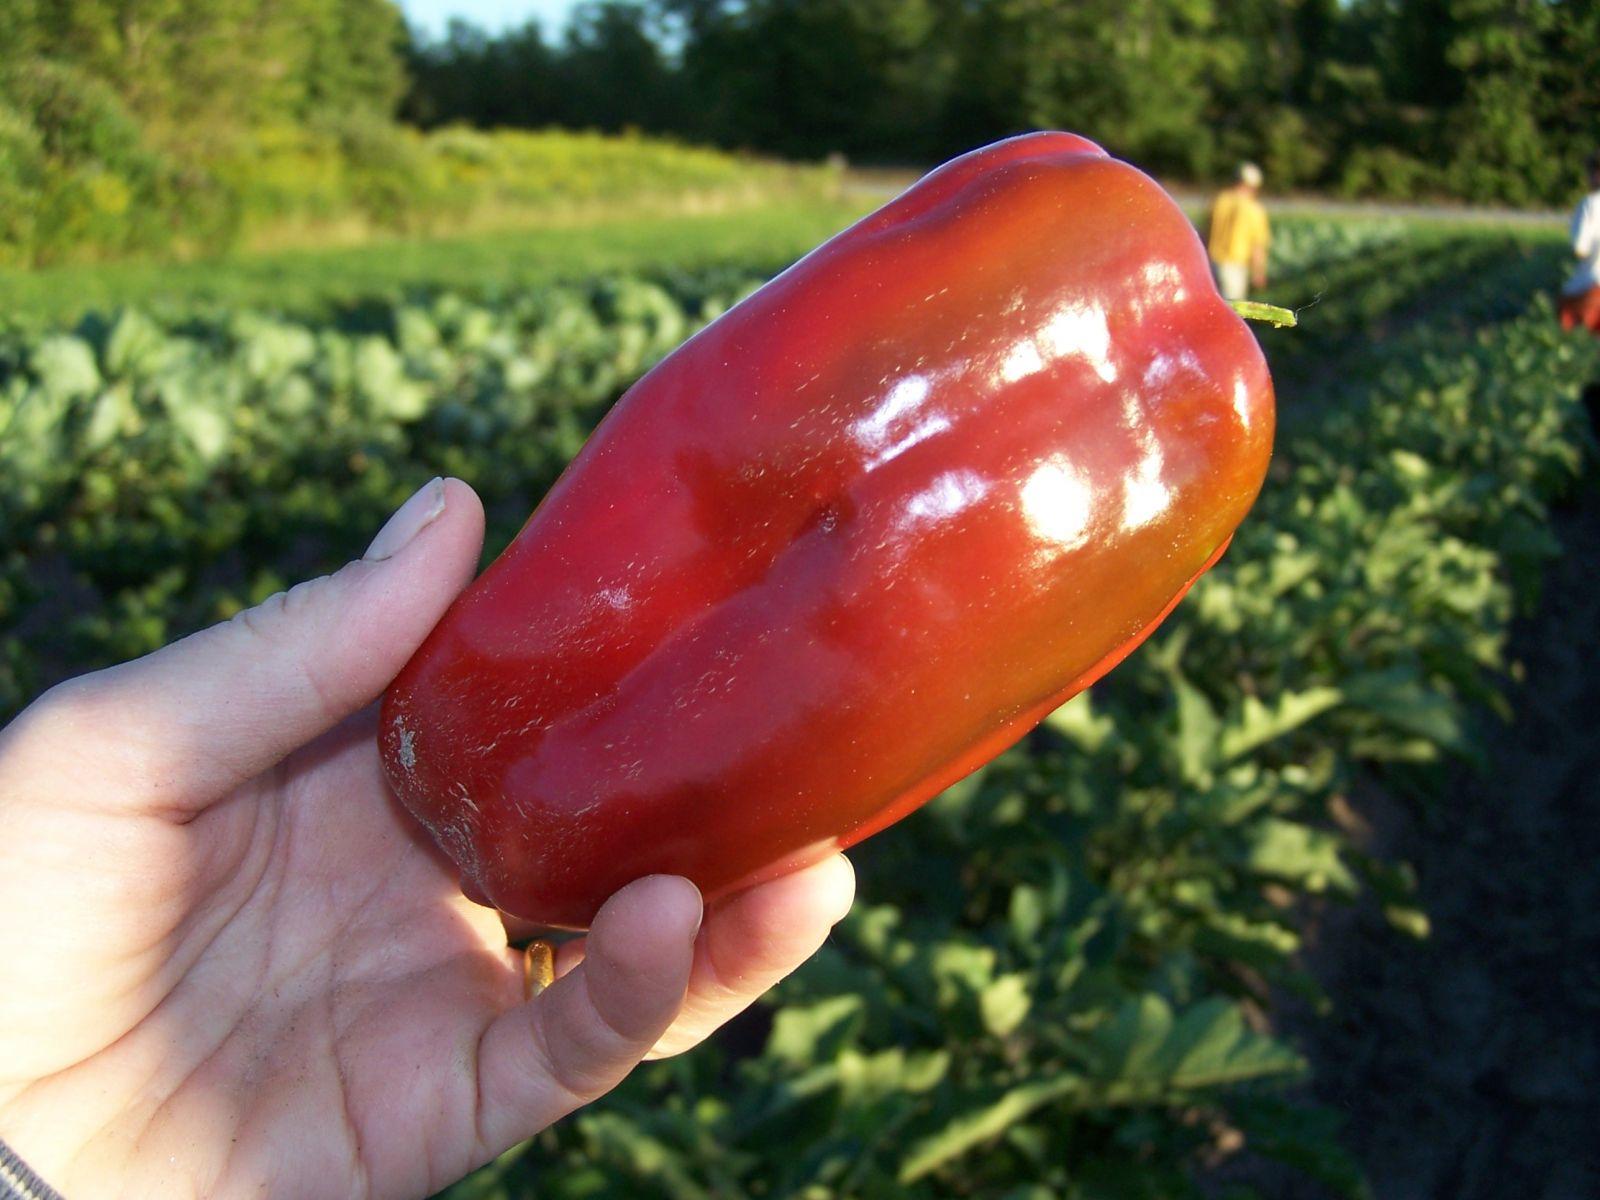 That's a big pepper! (Image courtesy of Essex Farm)